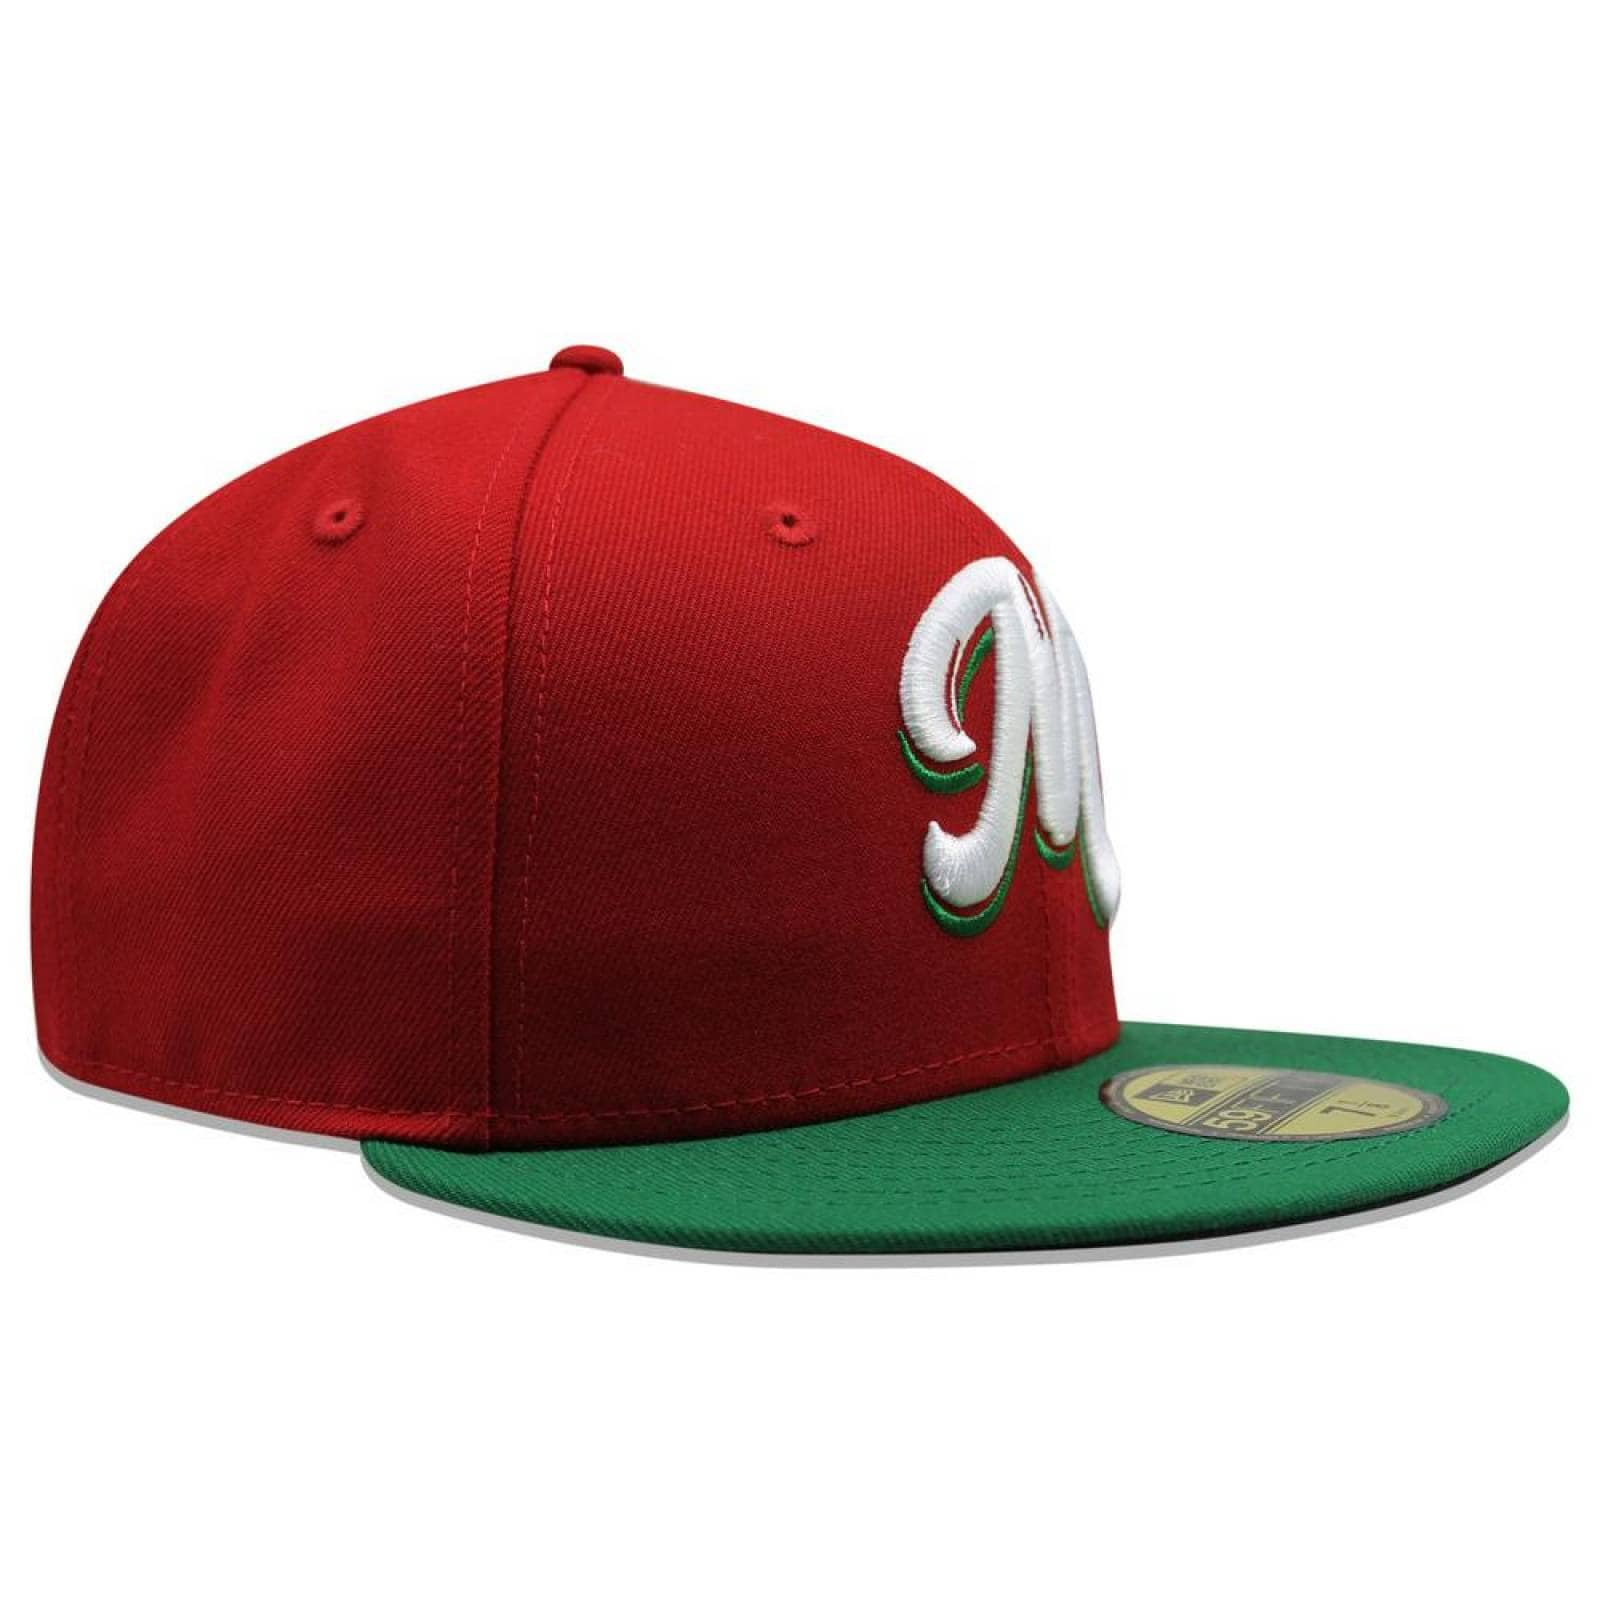 Gorra New Era 5950 LMP México Scarlet Green Vize Game Rojo